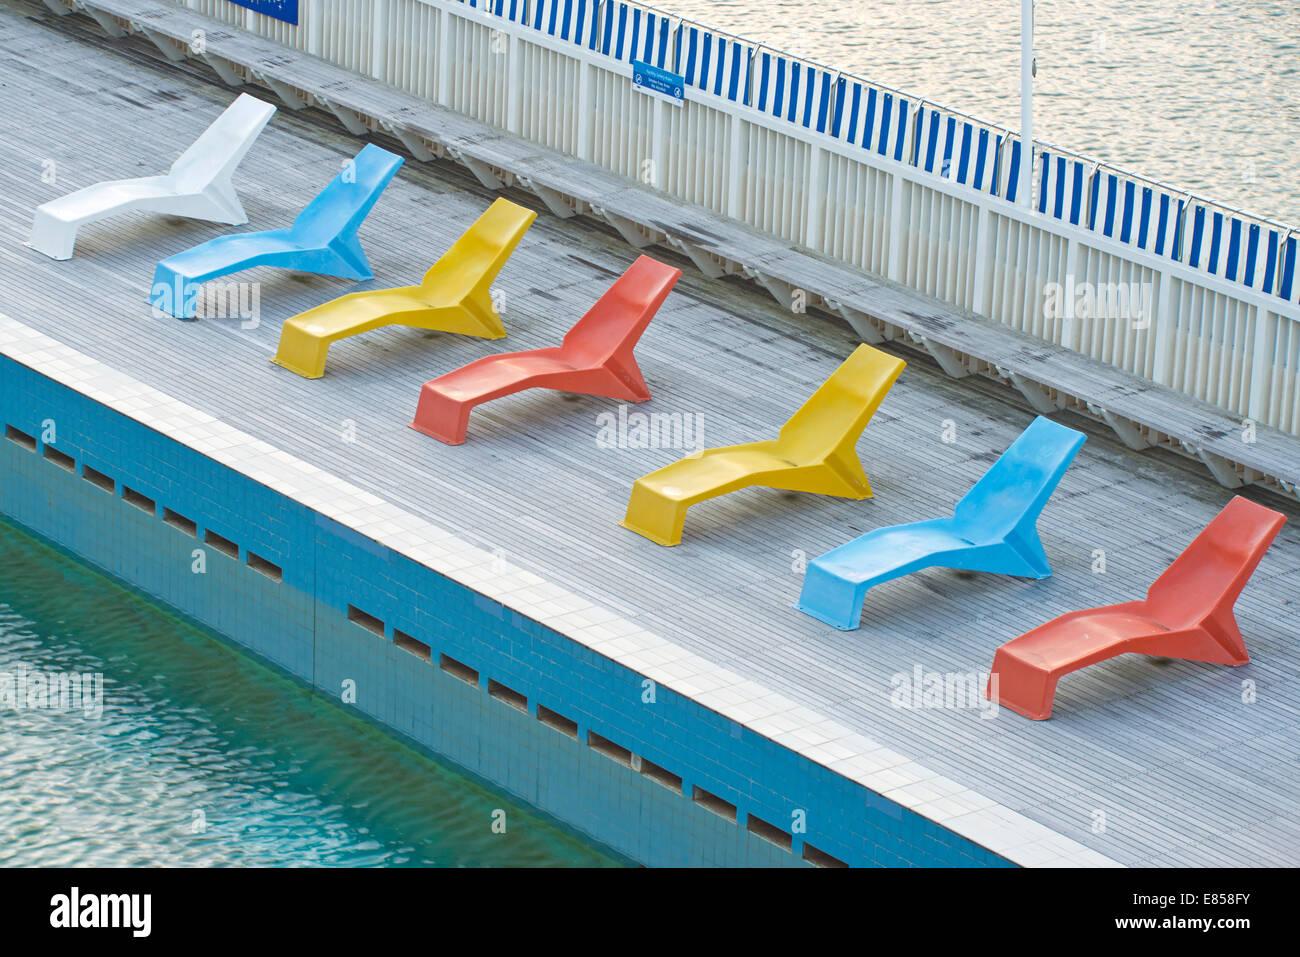 parnell pool